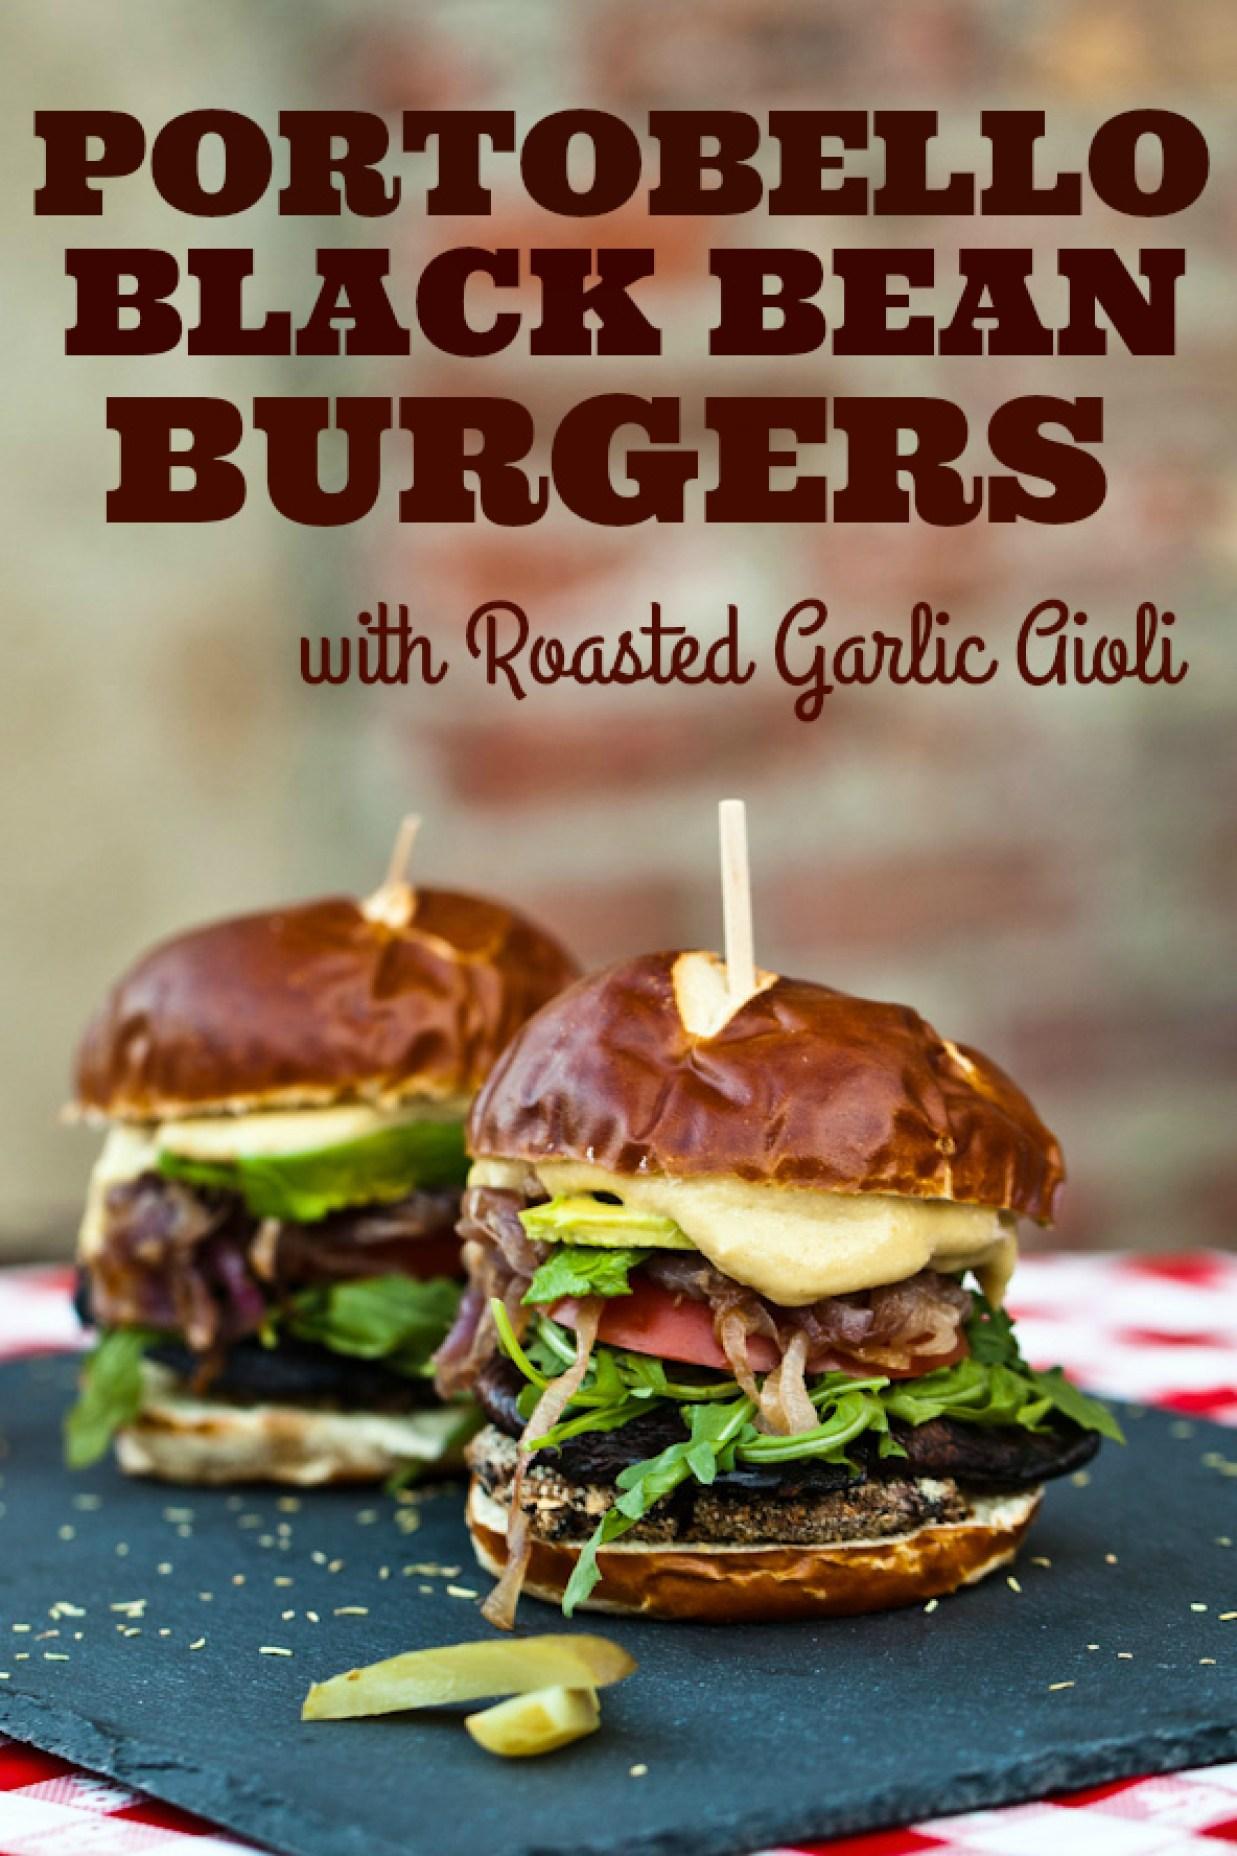 Portobello Black Bean Burgers